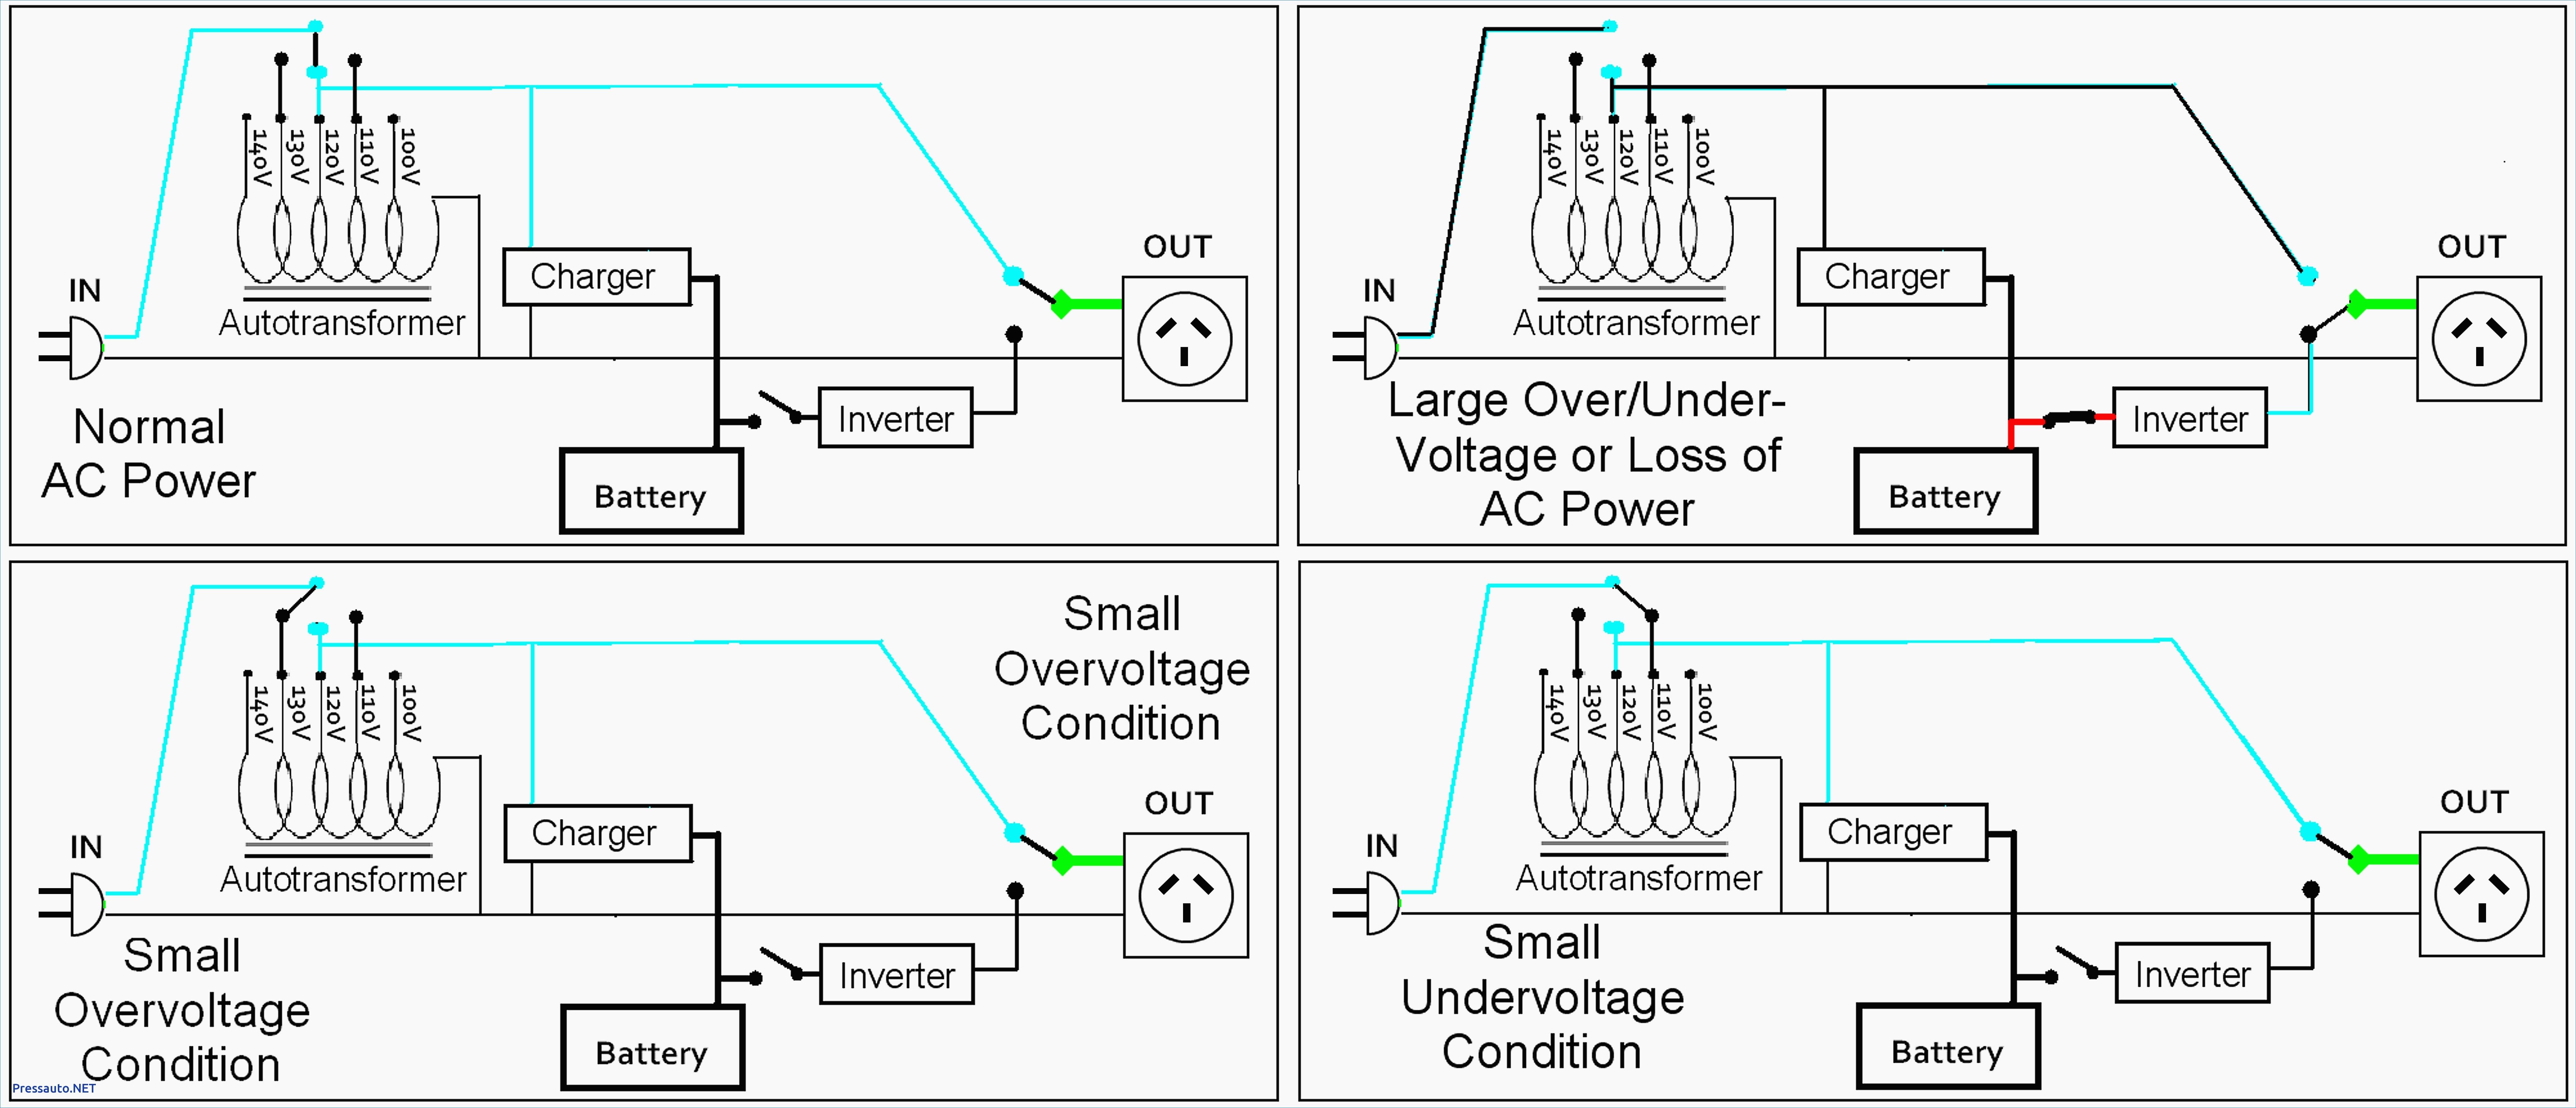 hevi duty transformer wiring diagram toyota vip alarm wiring diagram download free 480v to 120v transformer jpg fit 8333 2c3583 ssl 1 480v 120v 17m hevi duty transformer wiring diagram collection wiring diagram sample